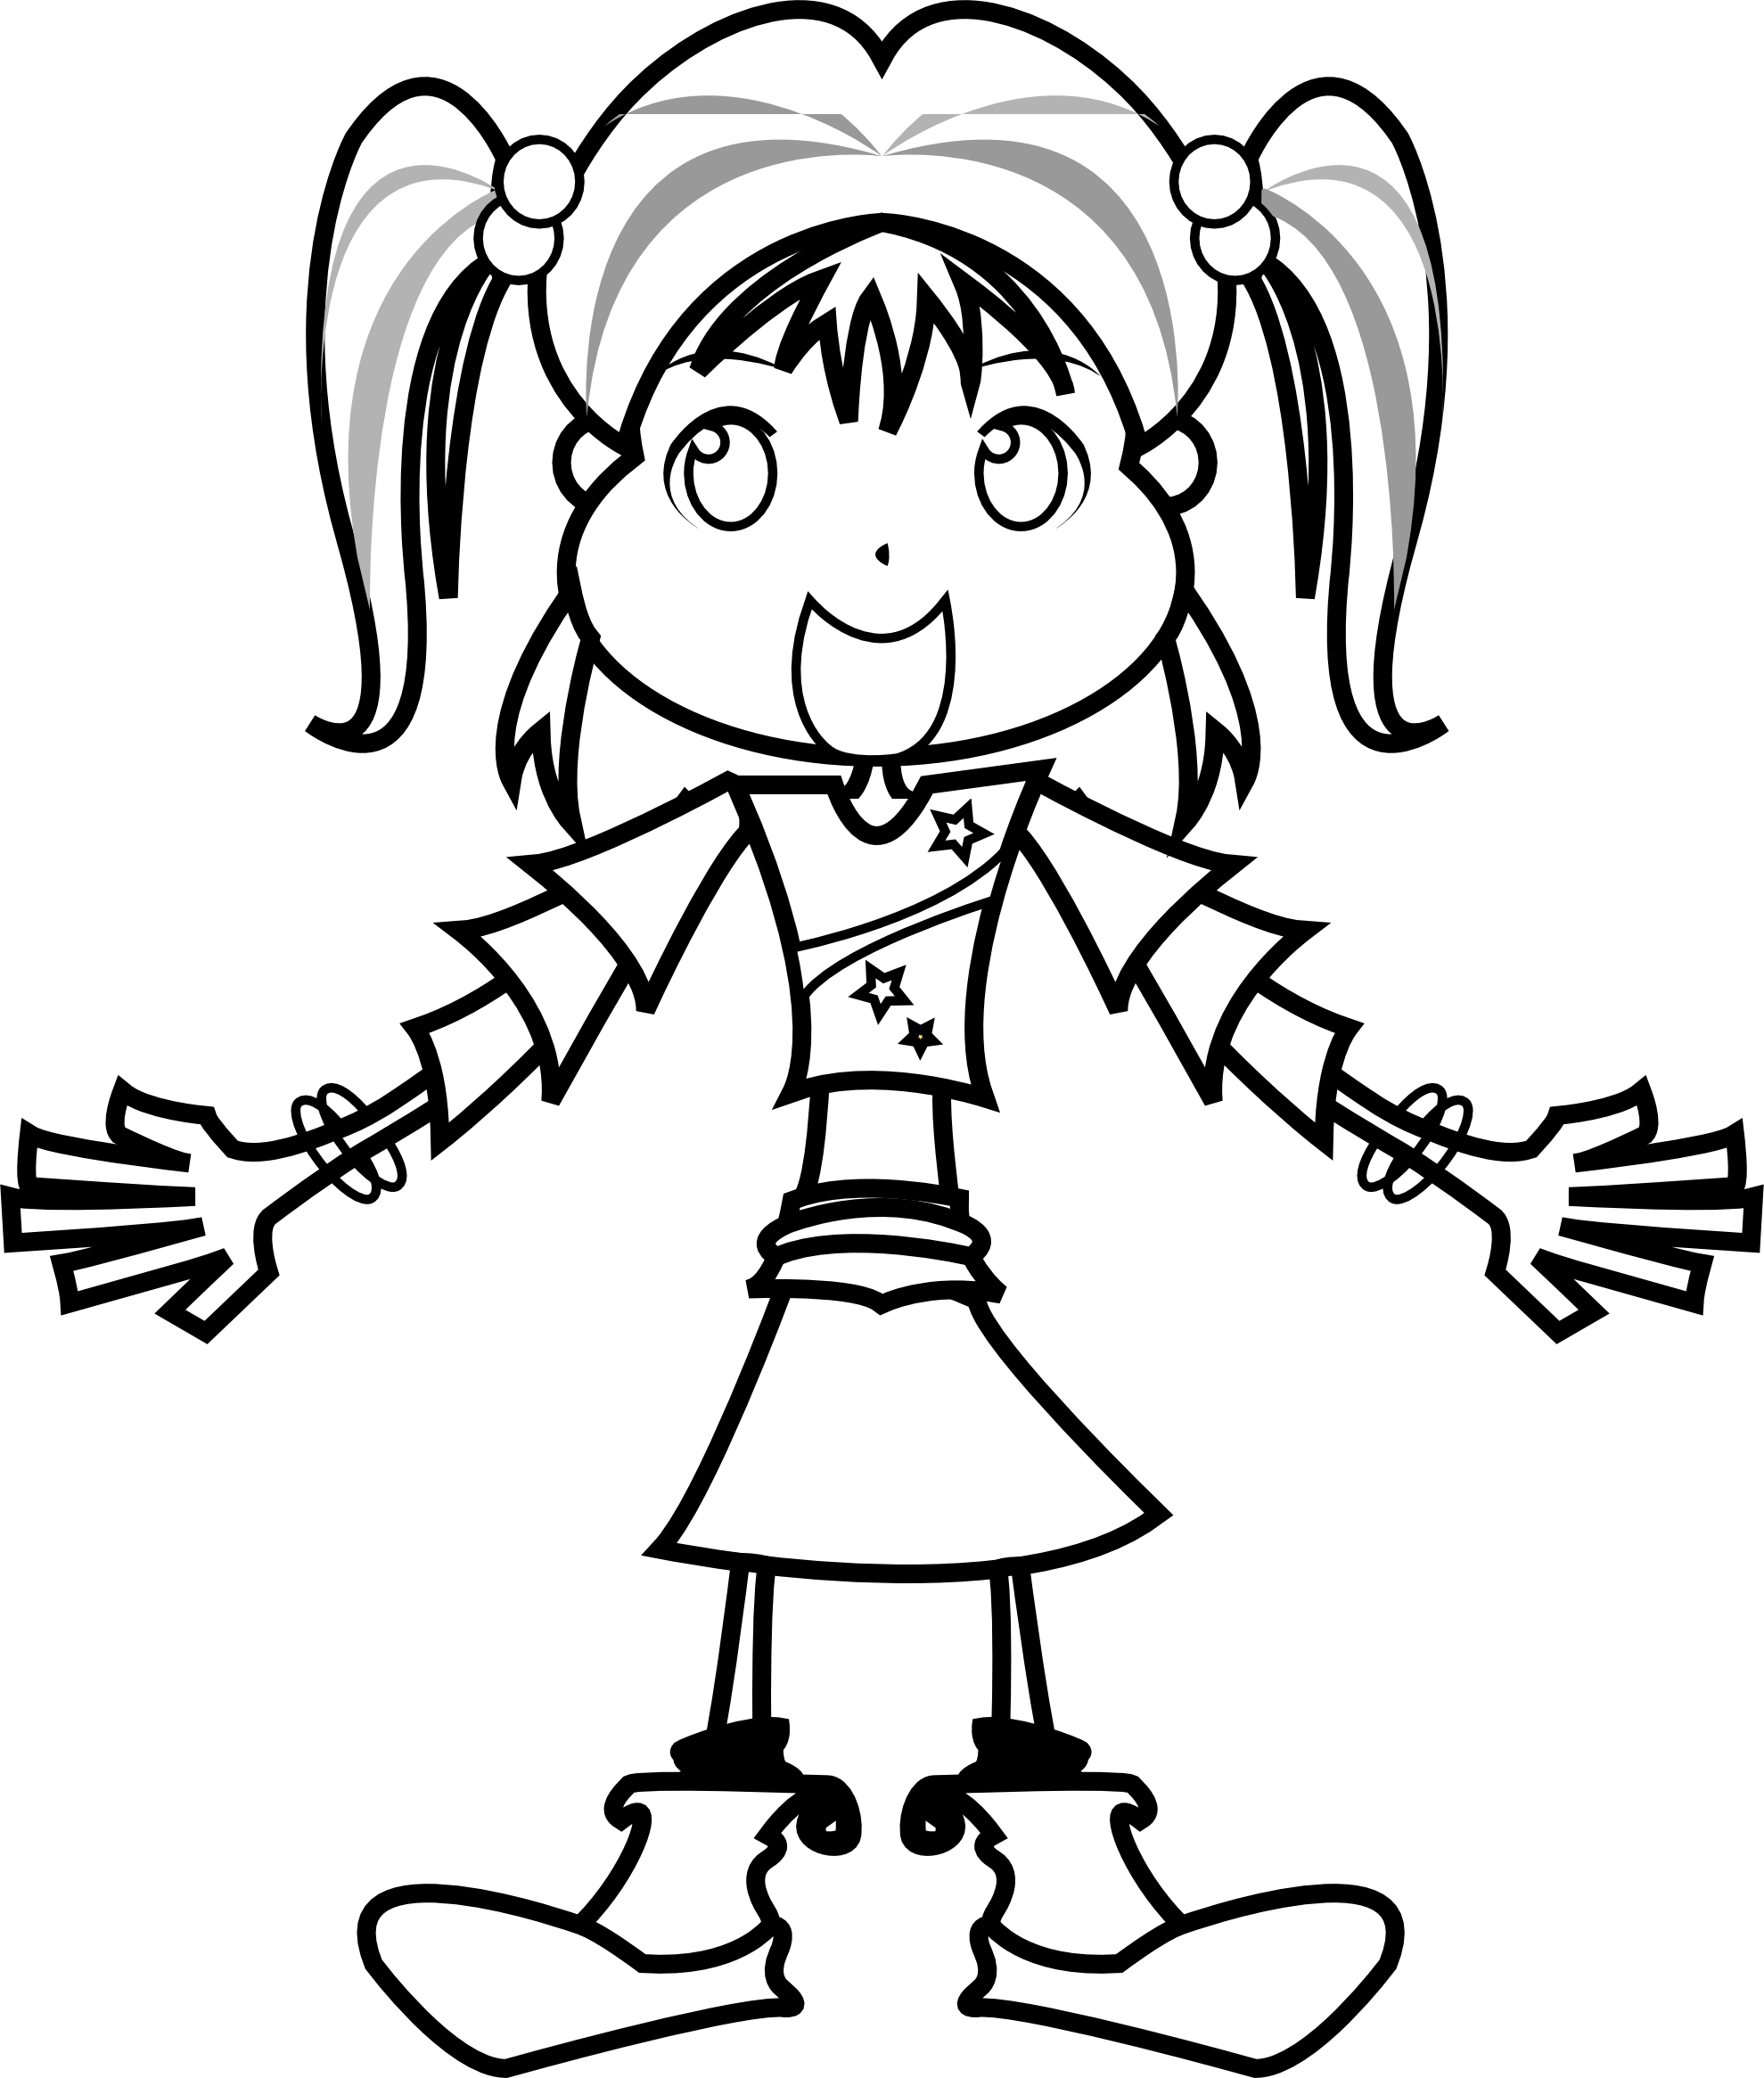 Sad Girl Clipart Black And White | Clipart Panda - Free ...